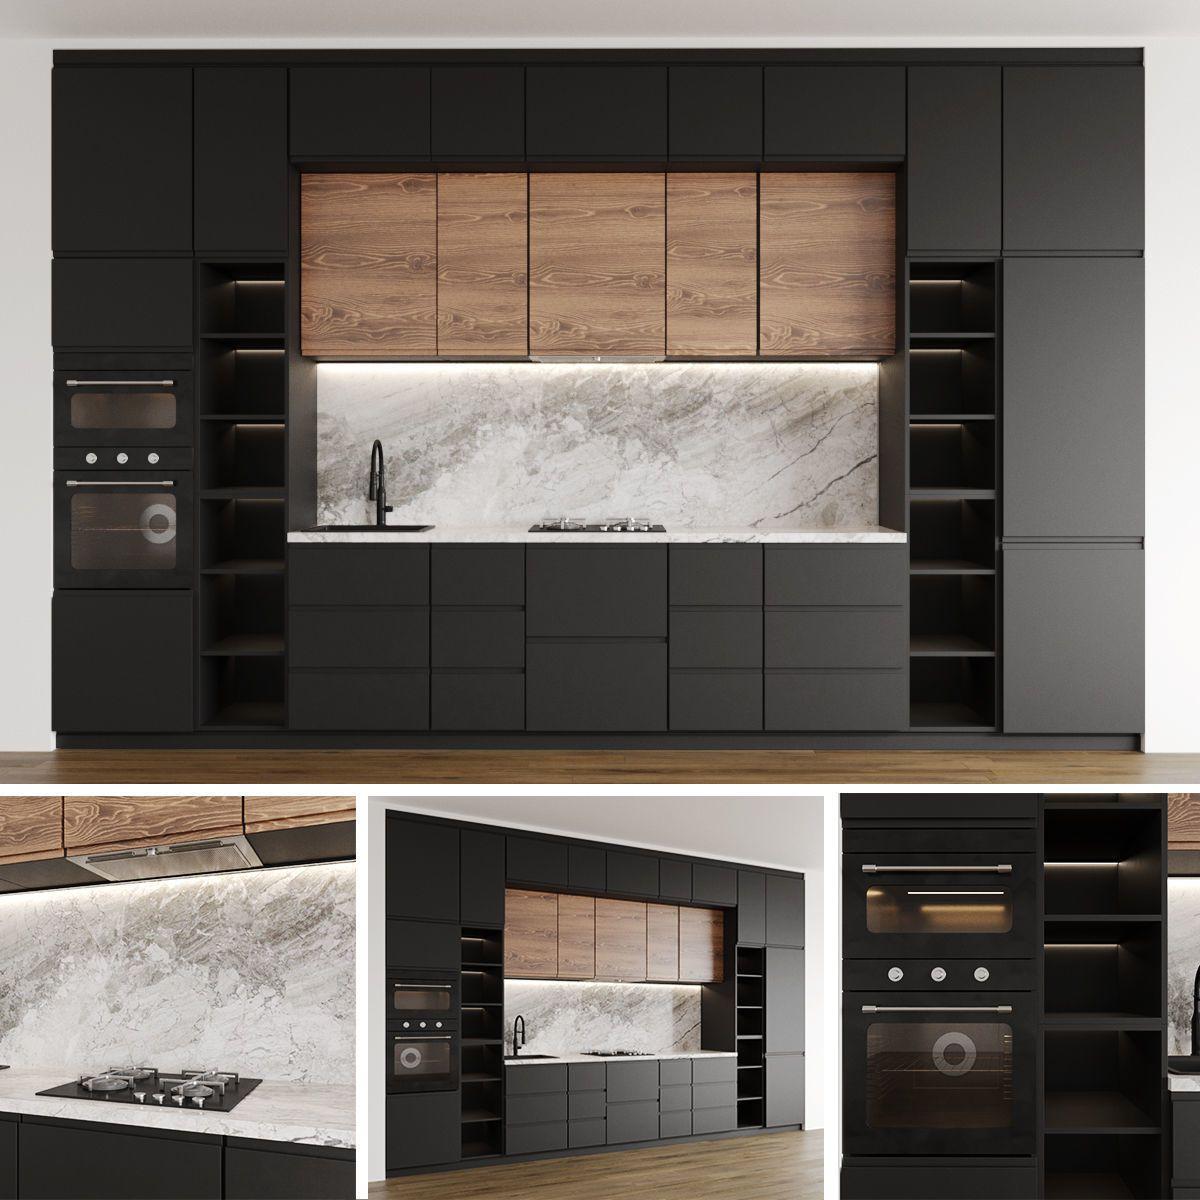 Modern Kitchen Ikea Voxtorp 3d Model In 2020 Modern Kitchen Ikea Kitchen Kitchen Models